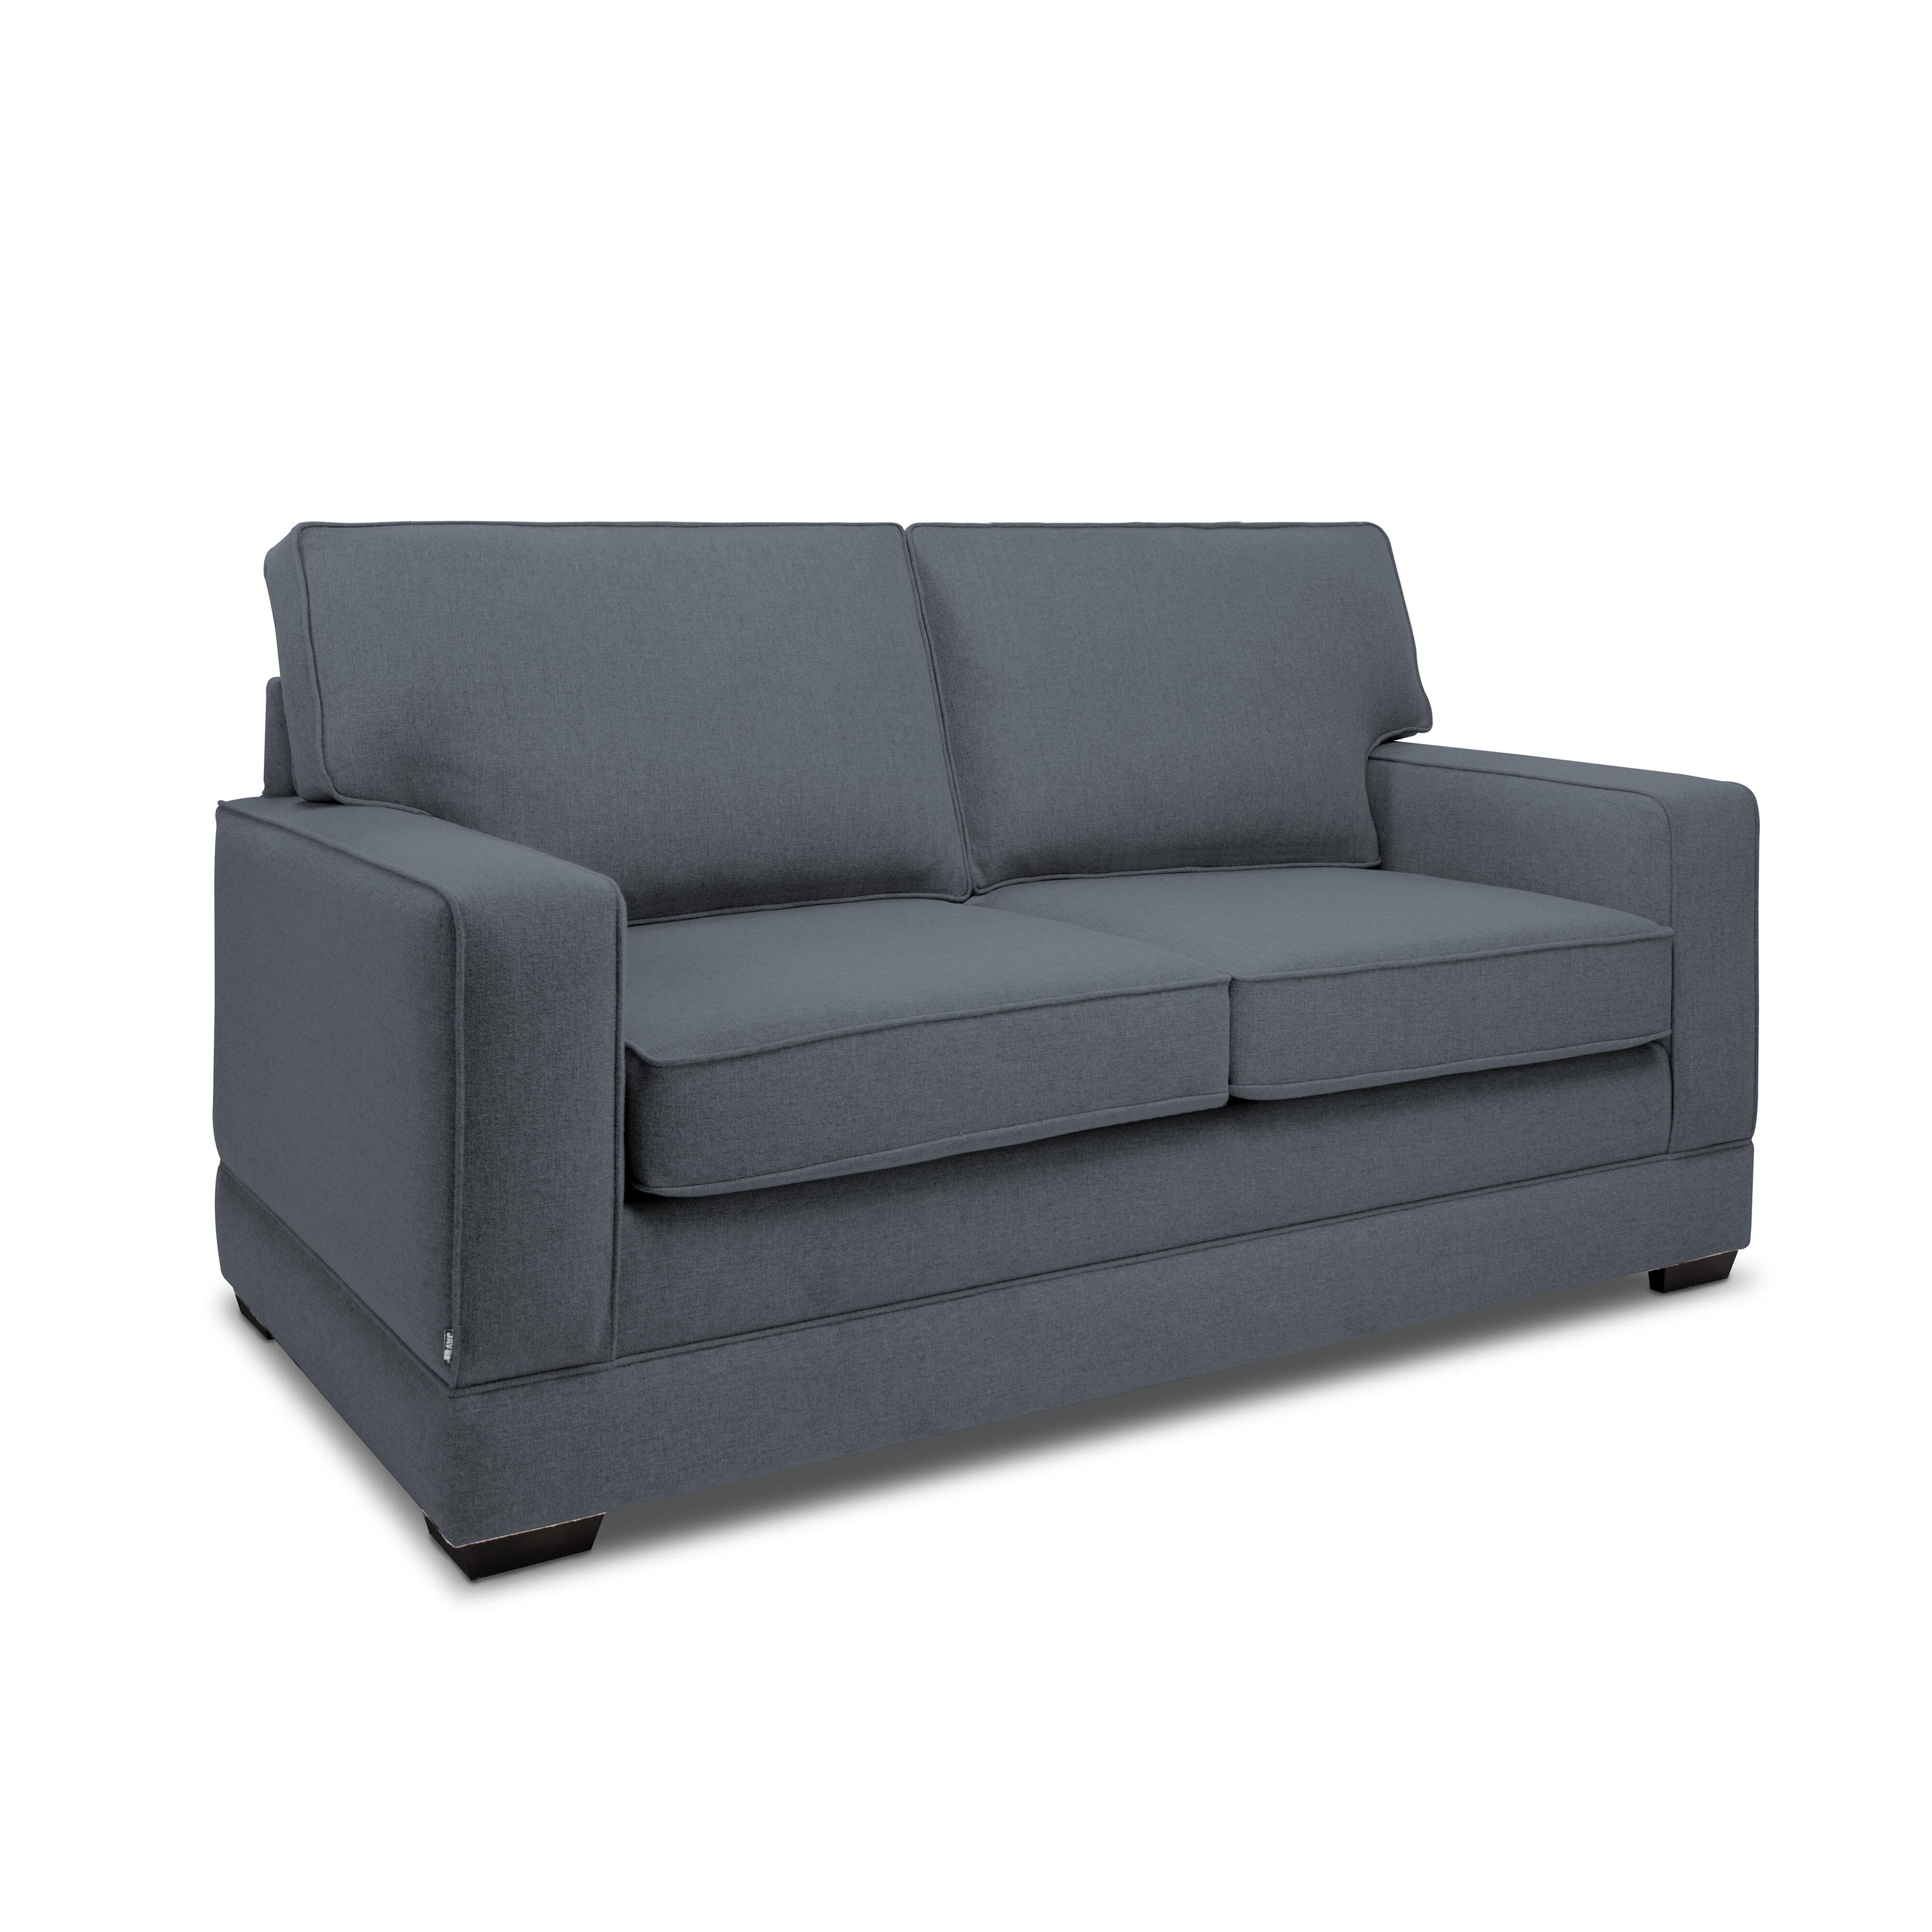 Jay be modern sofa 2 seater sofa bed wayfair co uk